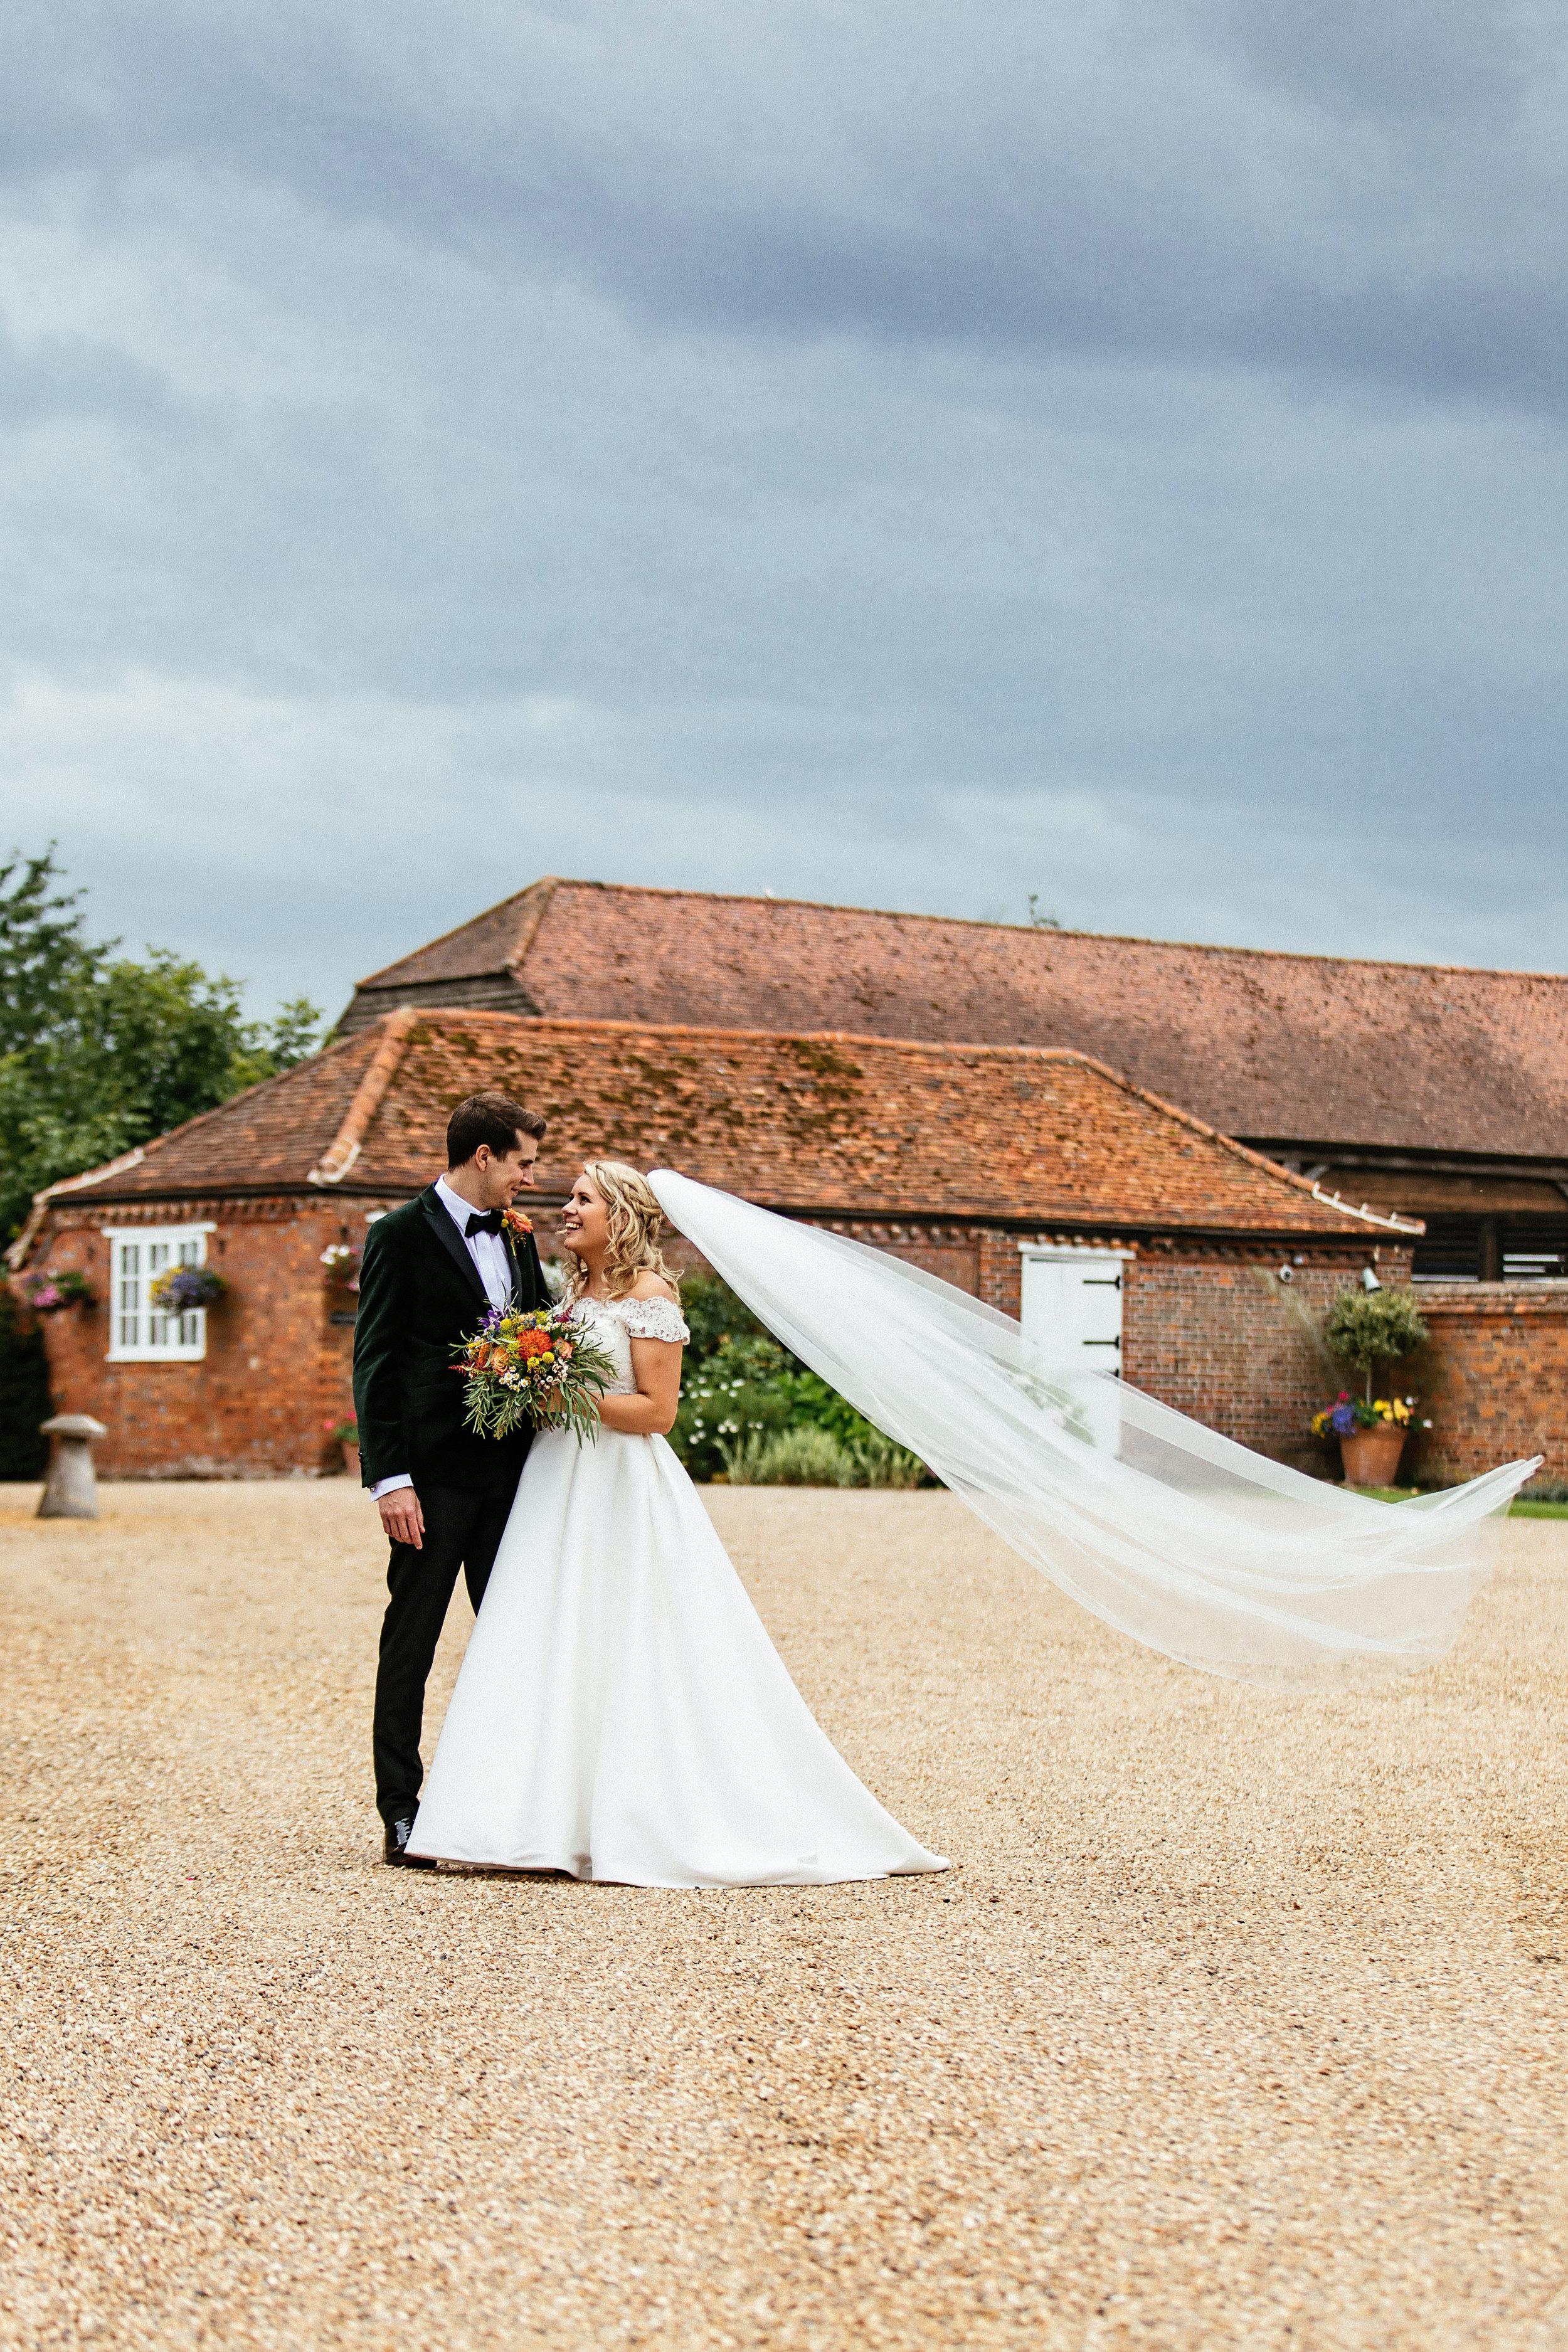 Tamara-and-Richard-Wedding-Highlights-47.jpg